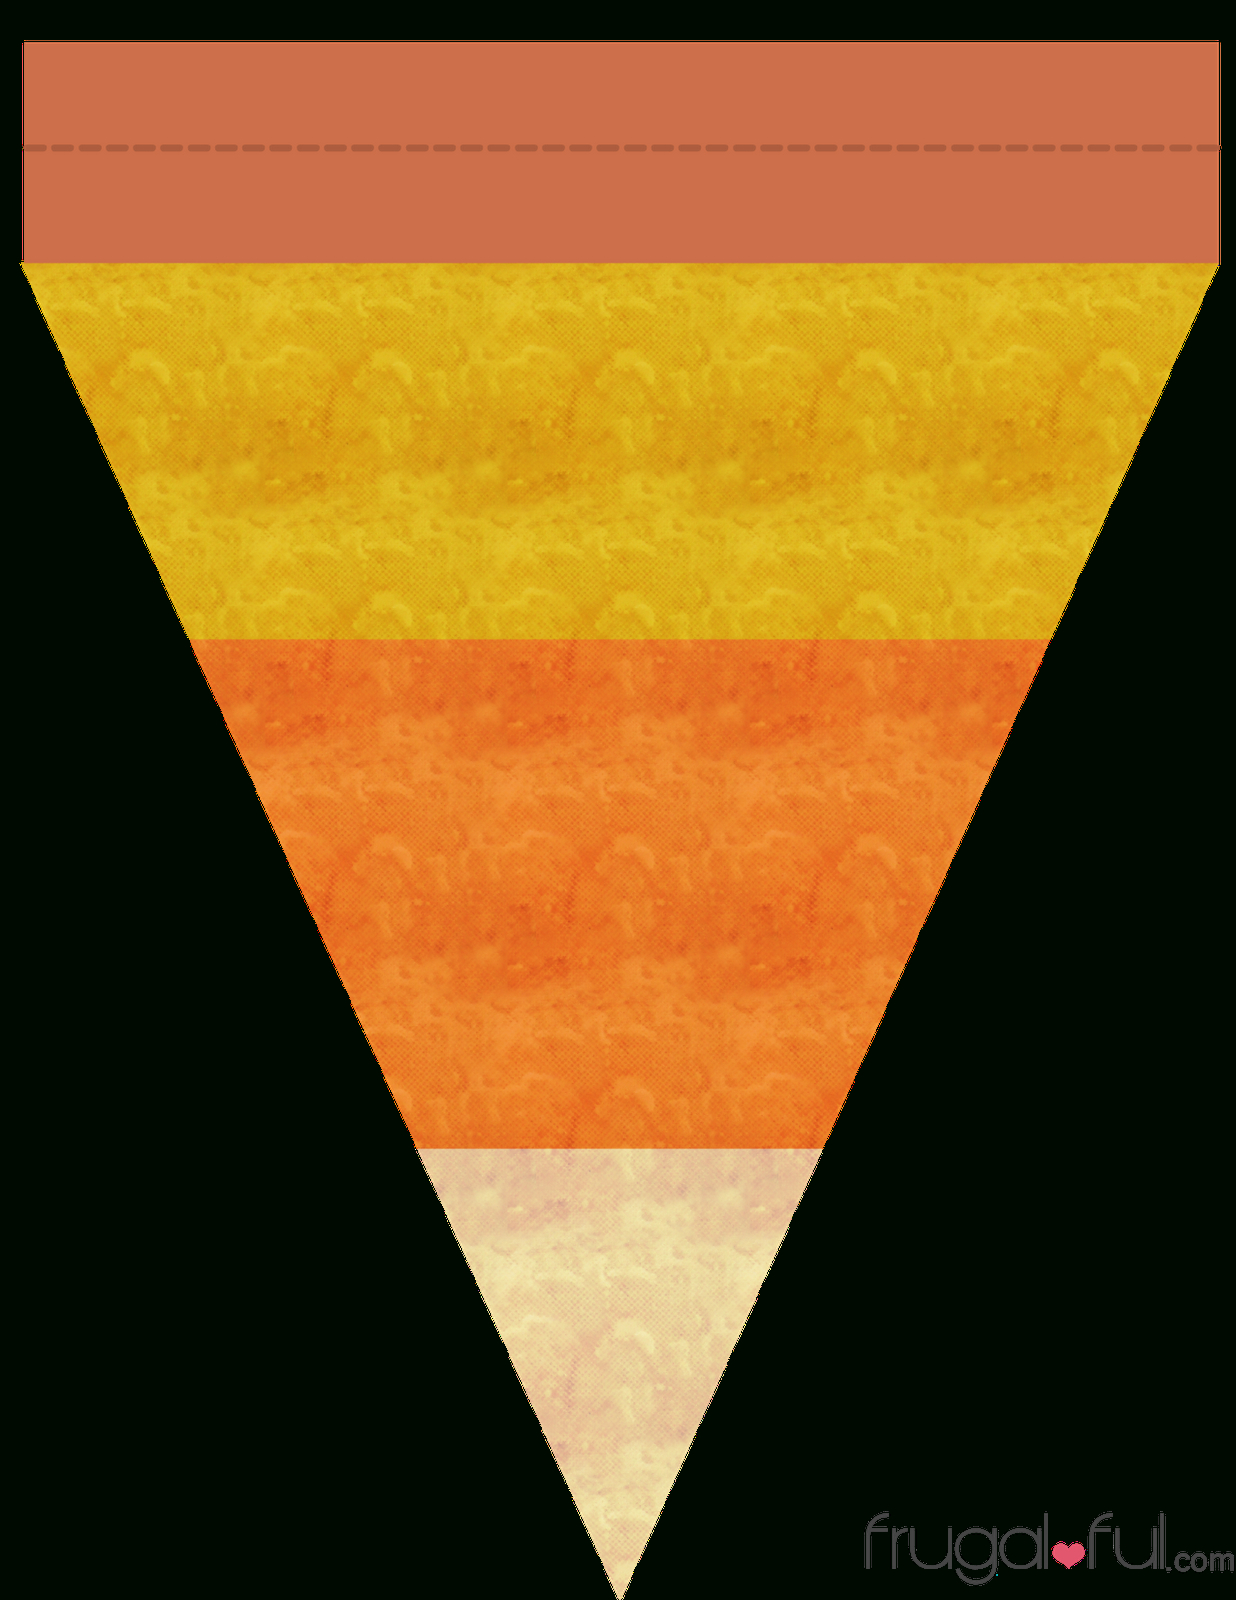 Diy} Free Printable Halloween Triangle Banner Template | Frugalful - Free Printable Halloween Banner Templates